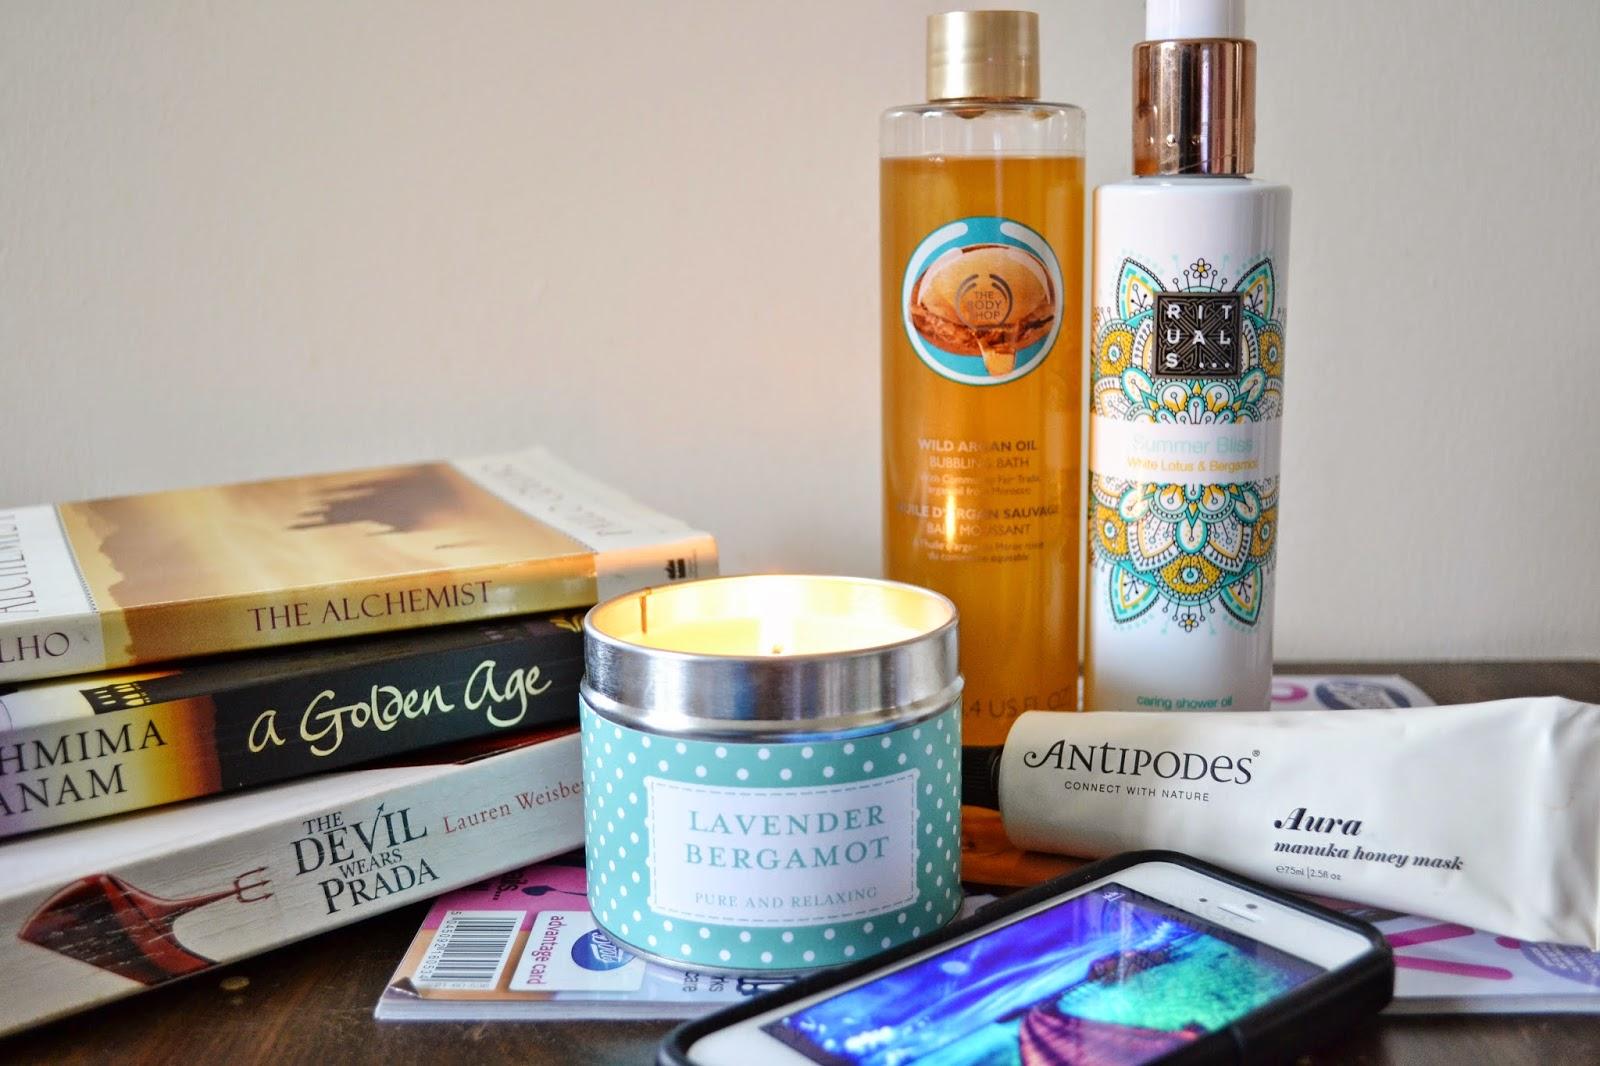 Relaxing Pamper Session ft The Body Shop Argan Oil Bubbling Bath, Rituals Summer Bliss Shower Oil, Antipodes Aura Manuka Honey Mask - Aspiring Londoner